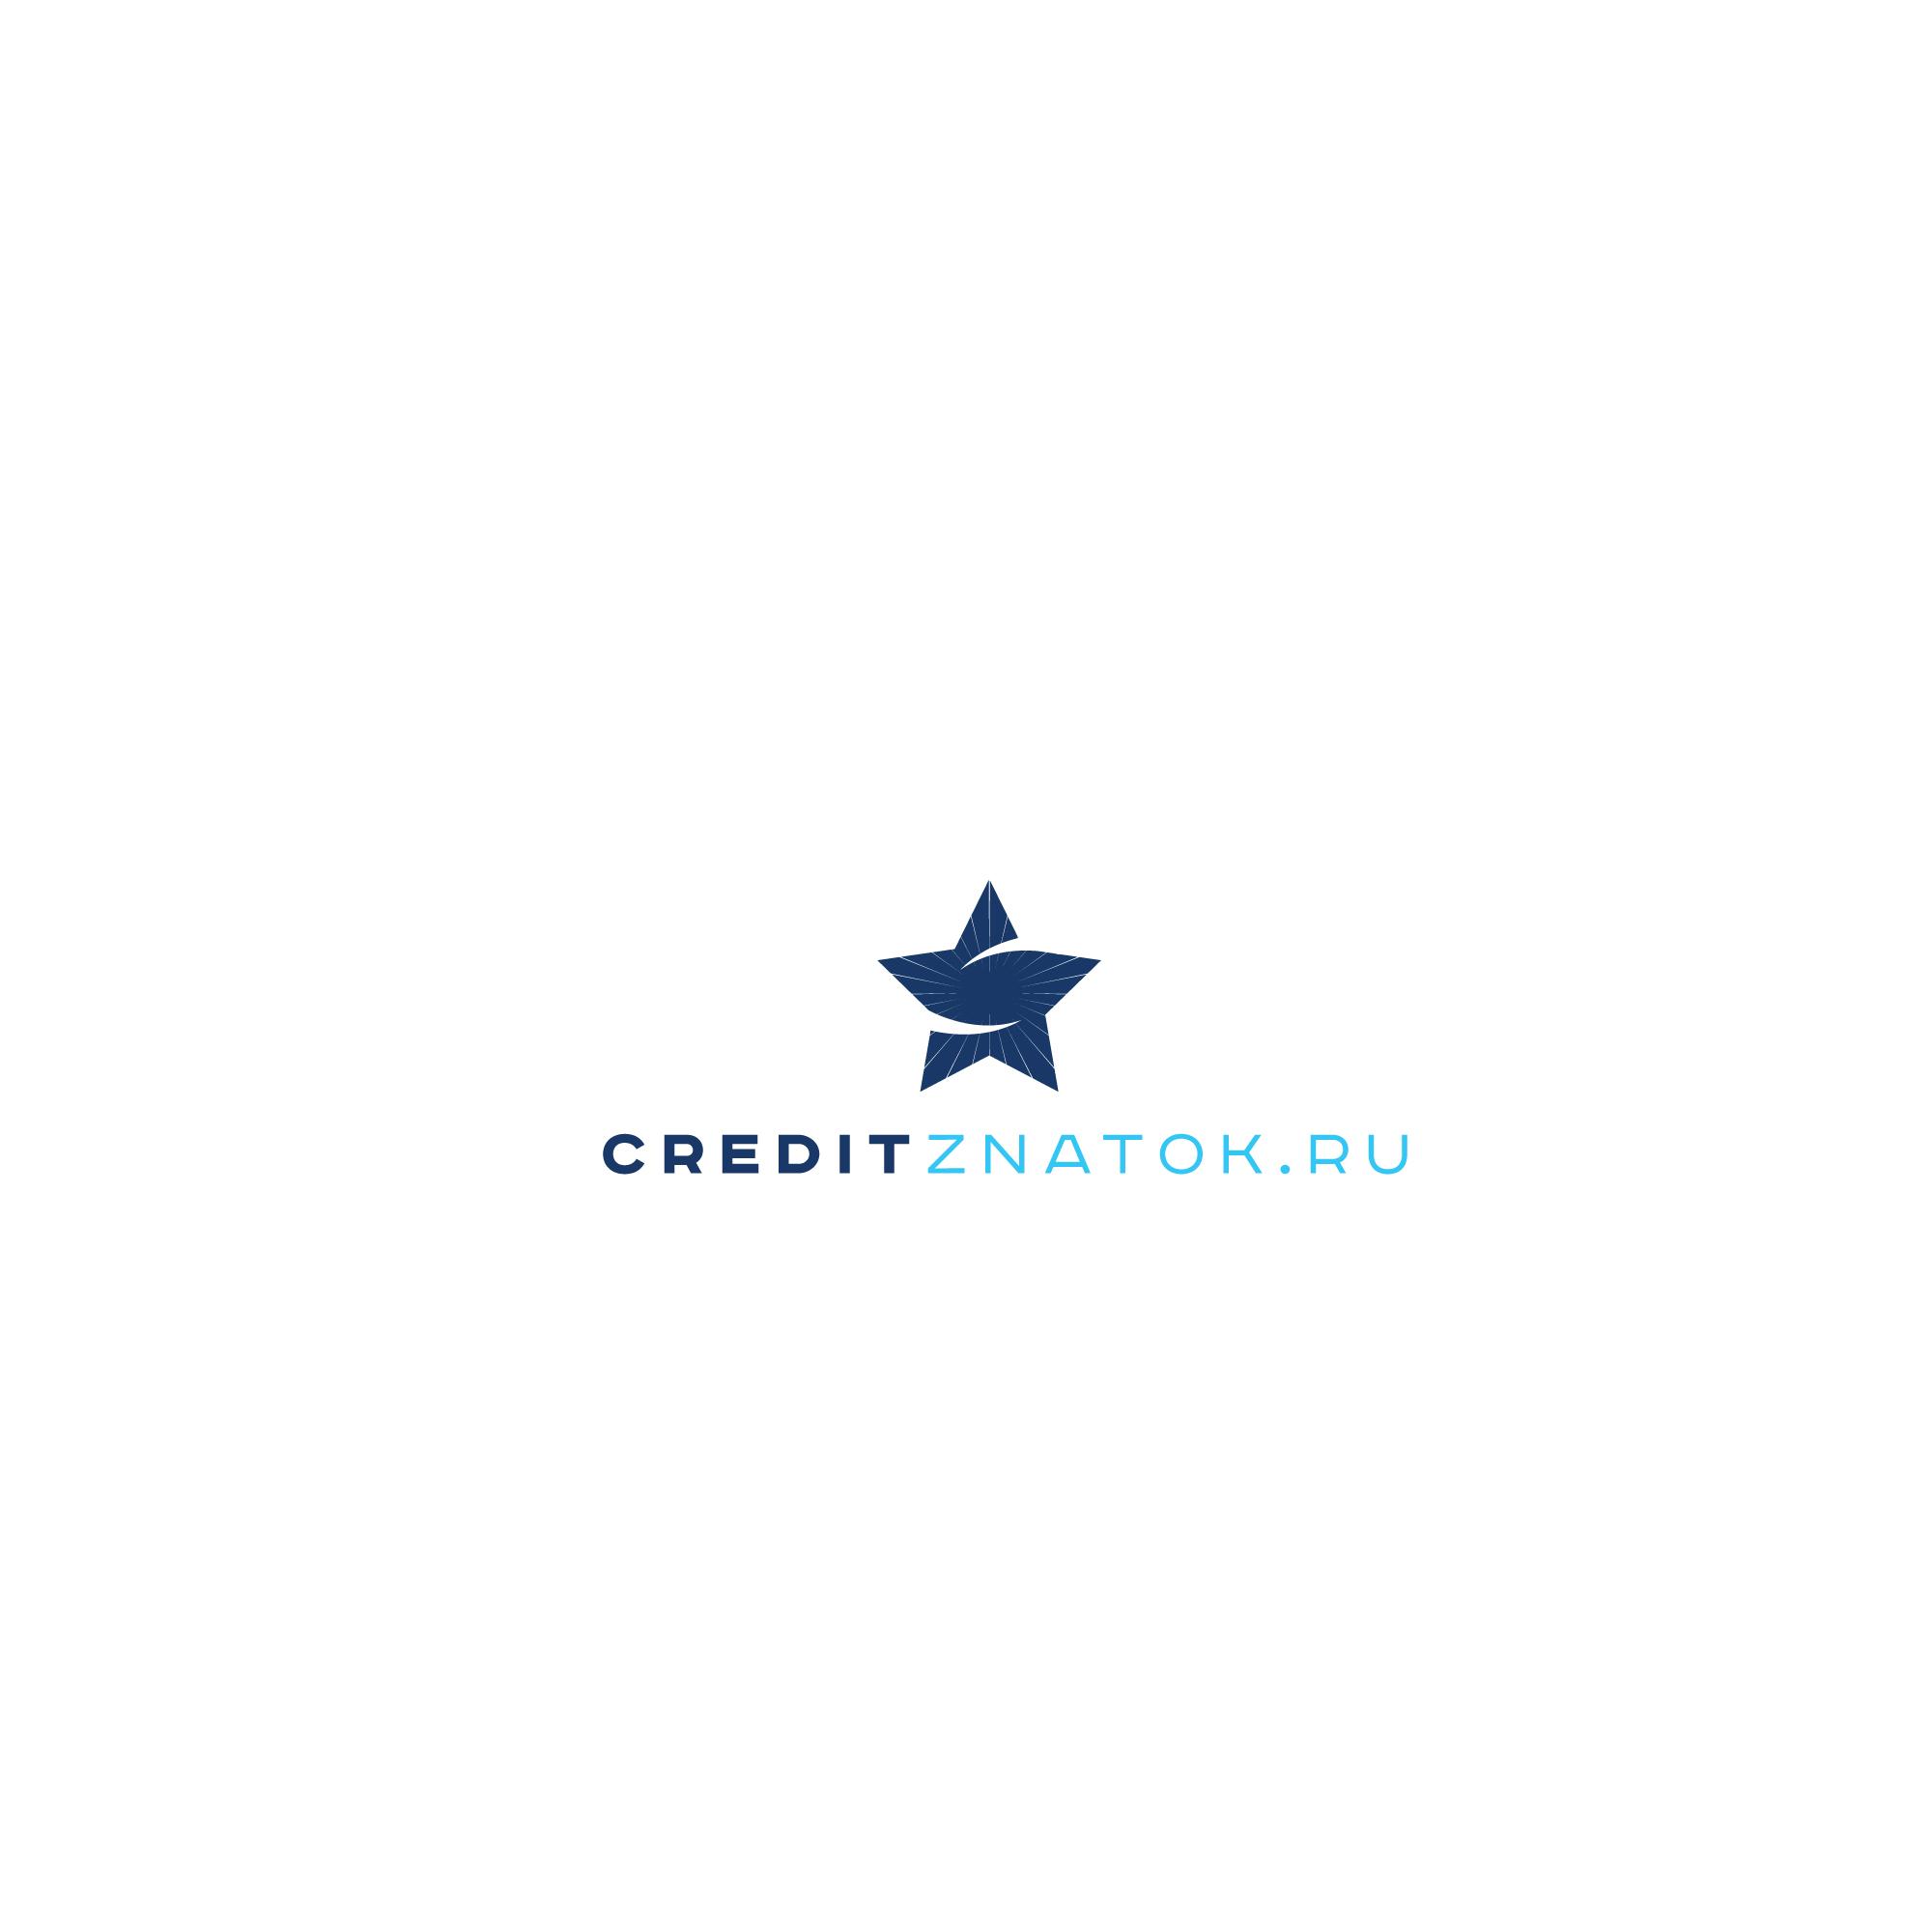 creditznatok.ru - логотип фото f_43058987901d9814.jpg